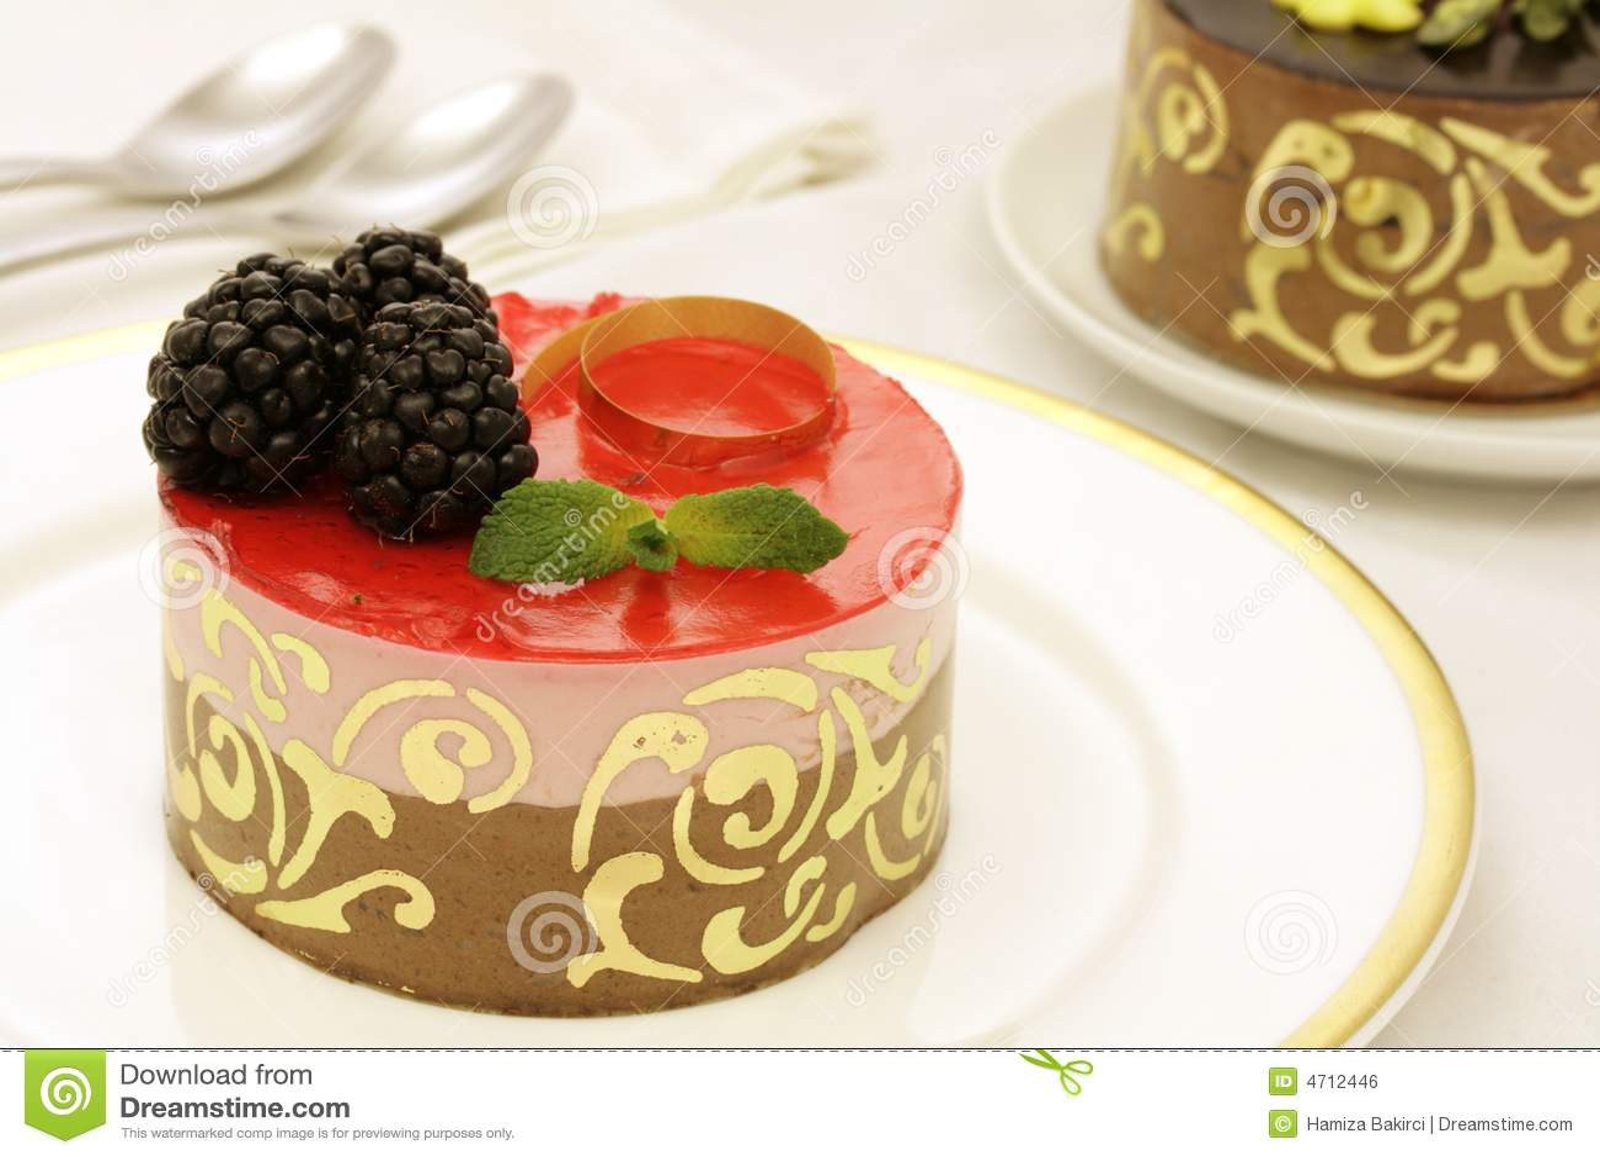 Chocolate Strawberry Jello Cake Recipe: Chocolate And Strawberry Mousse Cake Royalty Free Stock